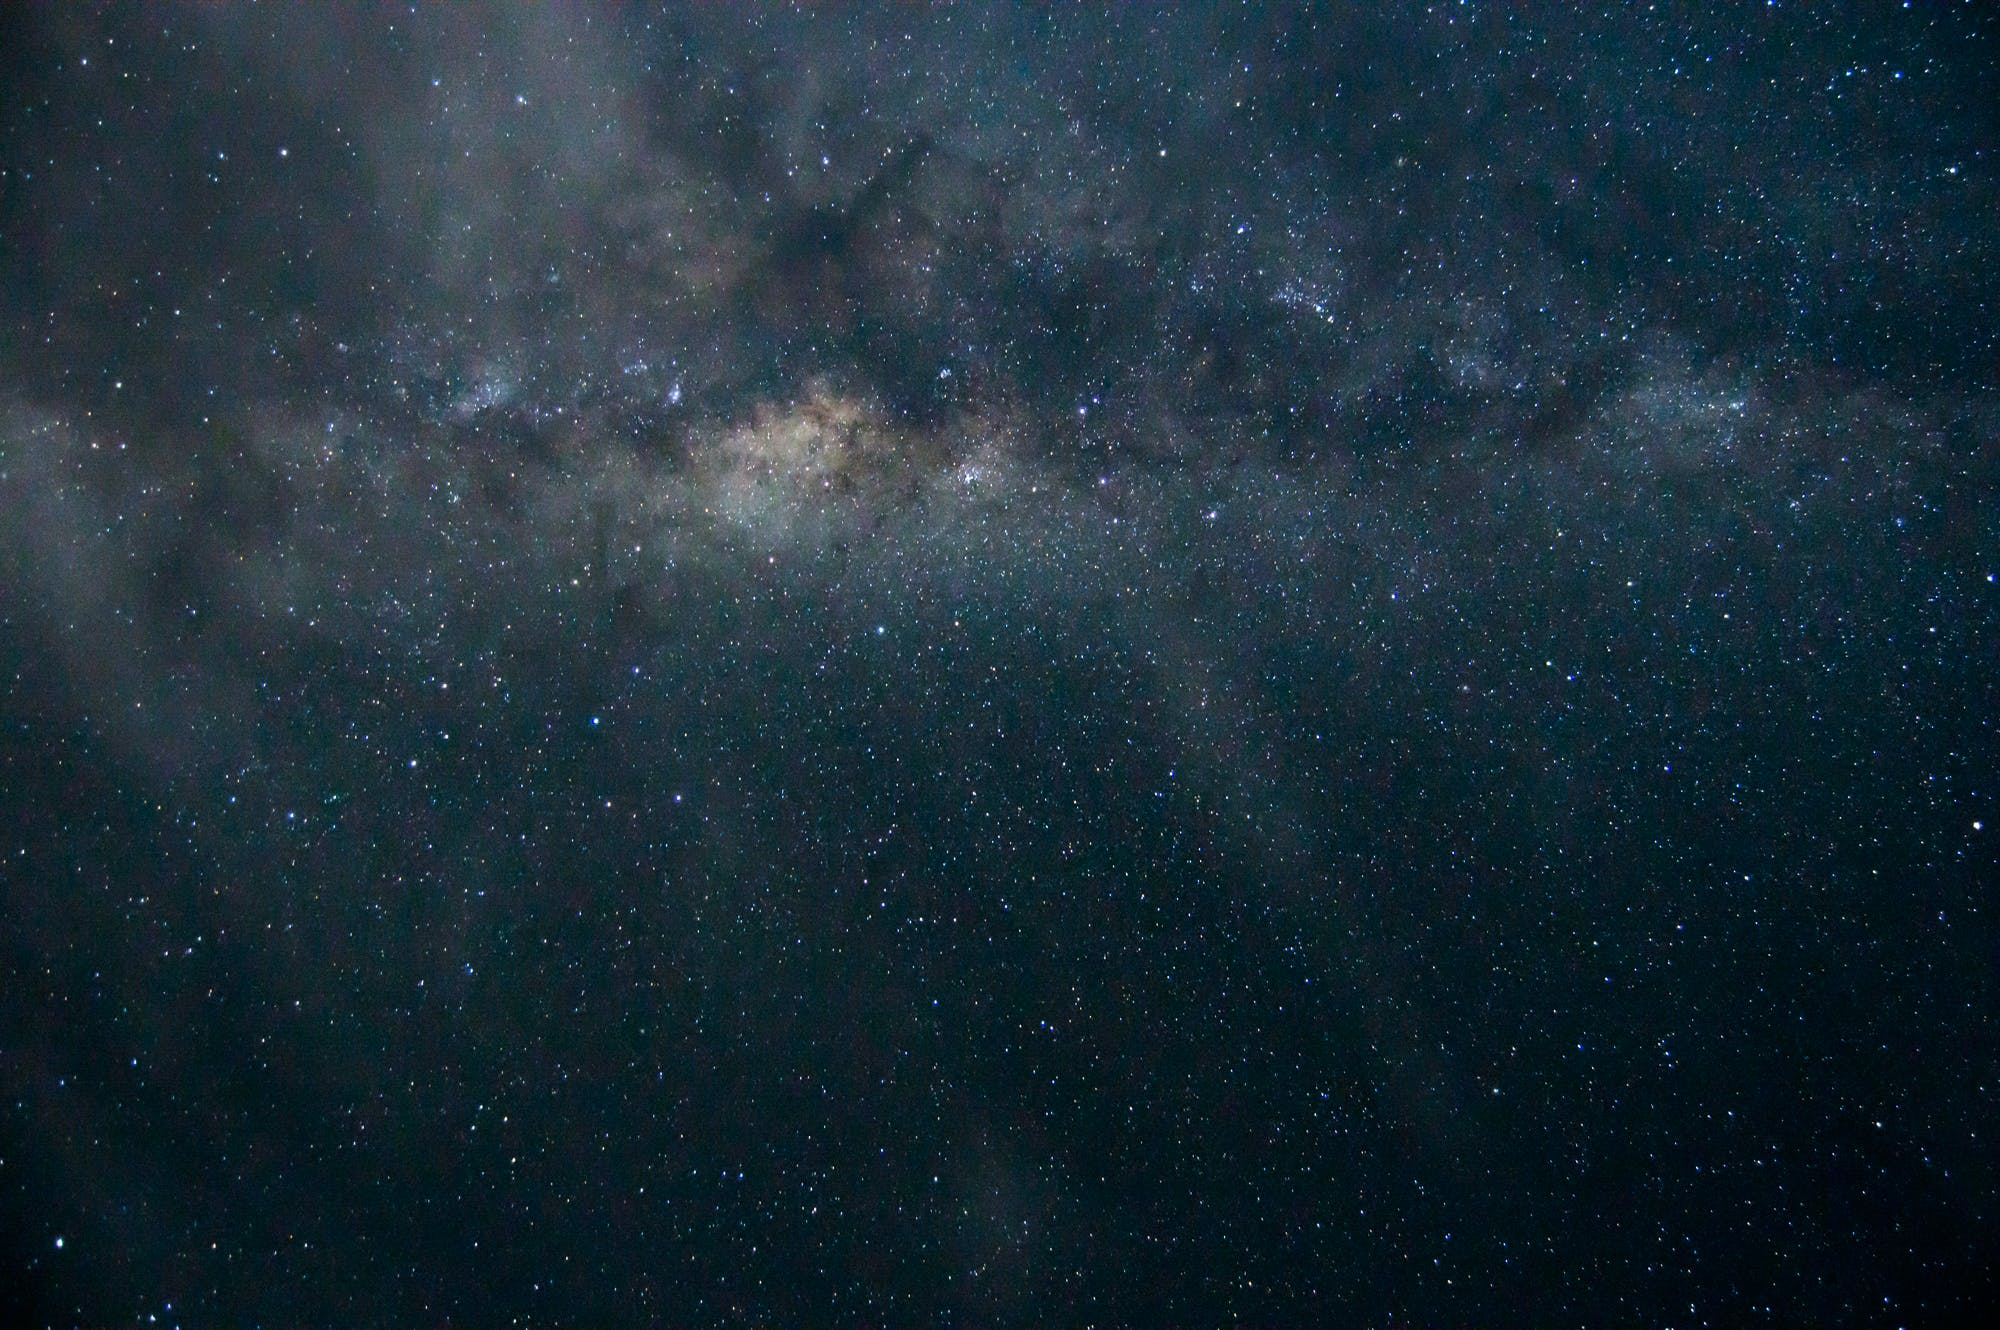 Kostenloses Stock Foto zu astronomie, dunkel, galaxie, himmel